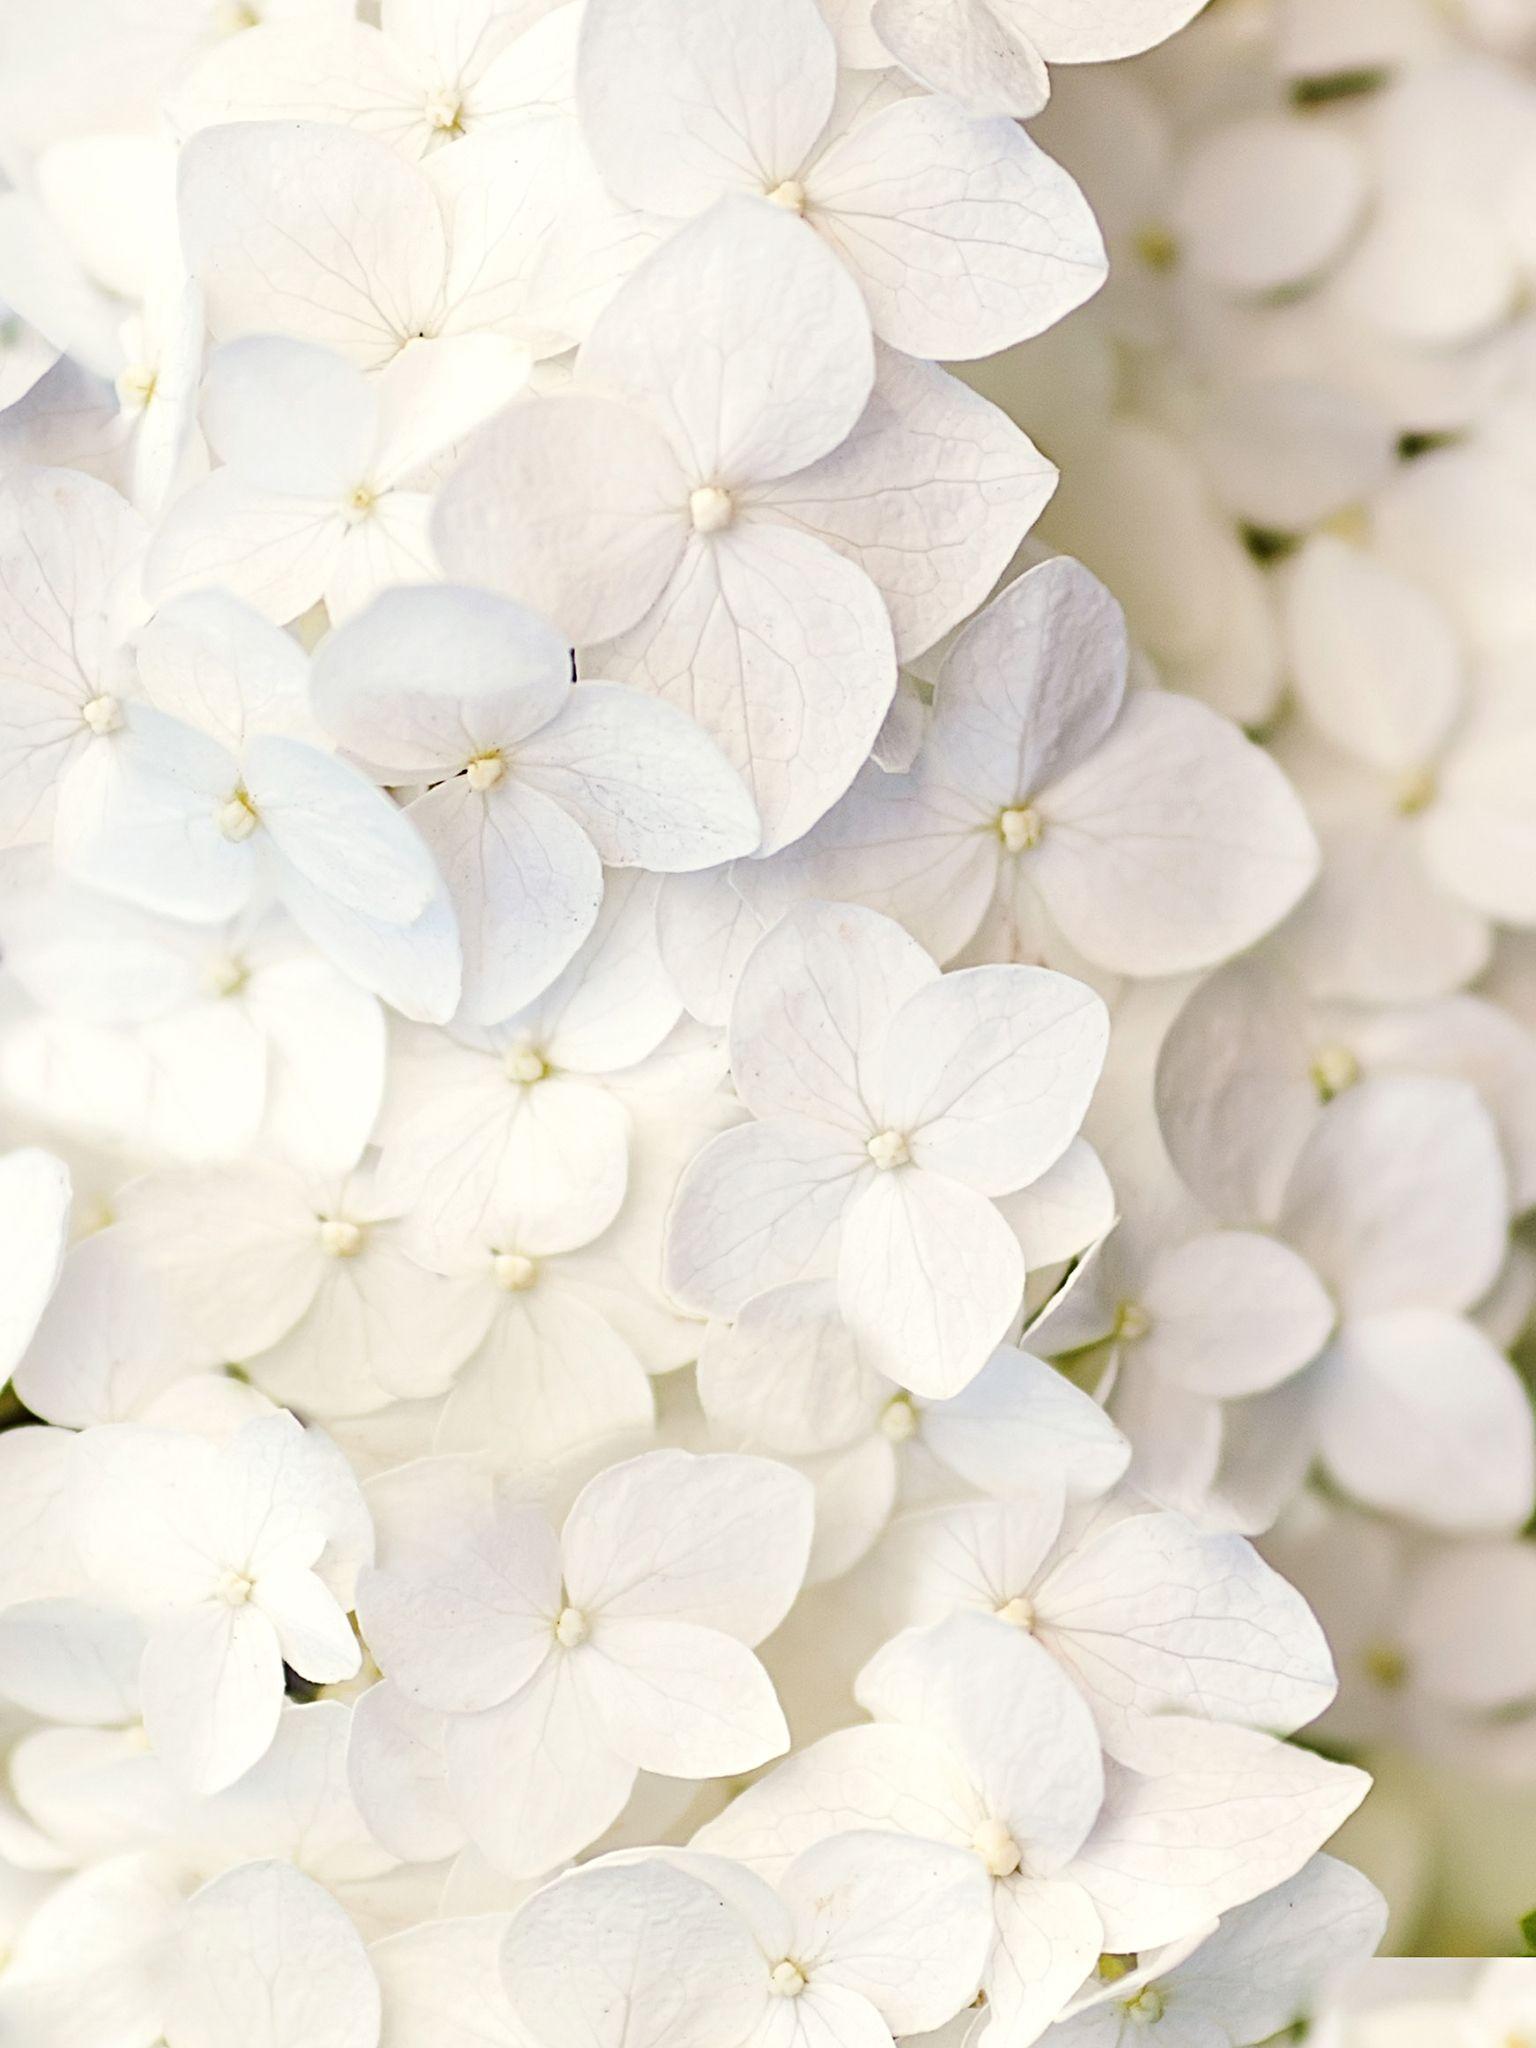 White Flowers Wallpaper Pinterest Wallpaper Iphone Wallpaper